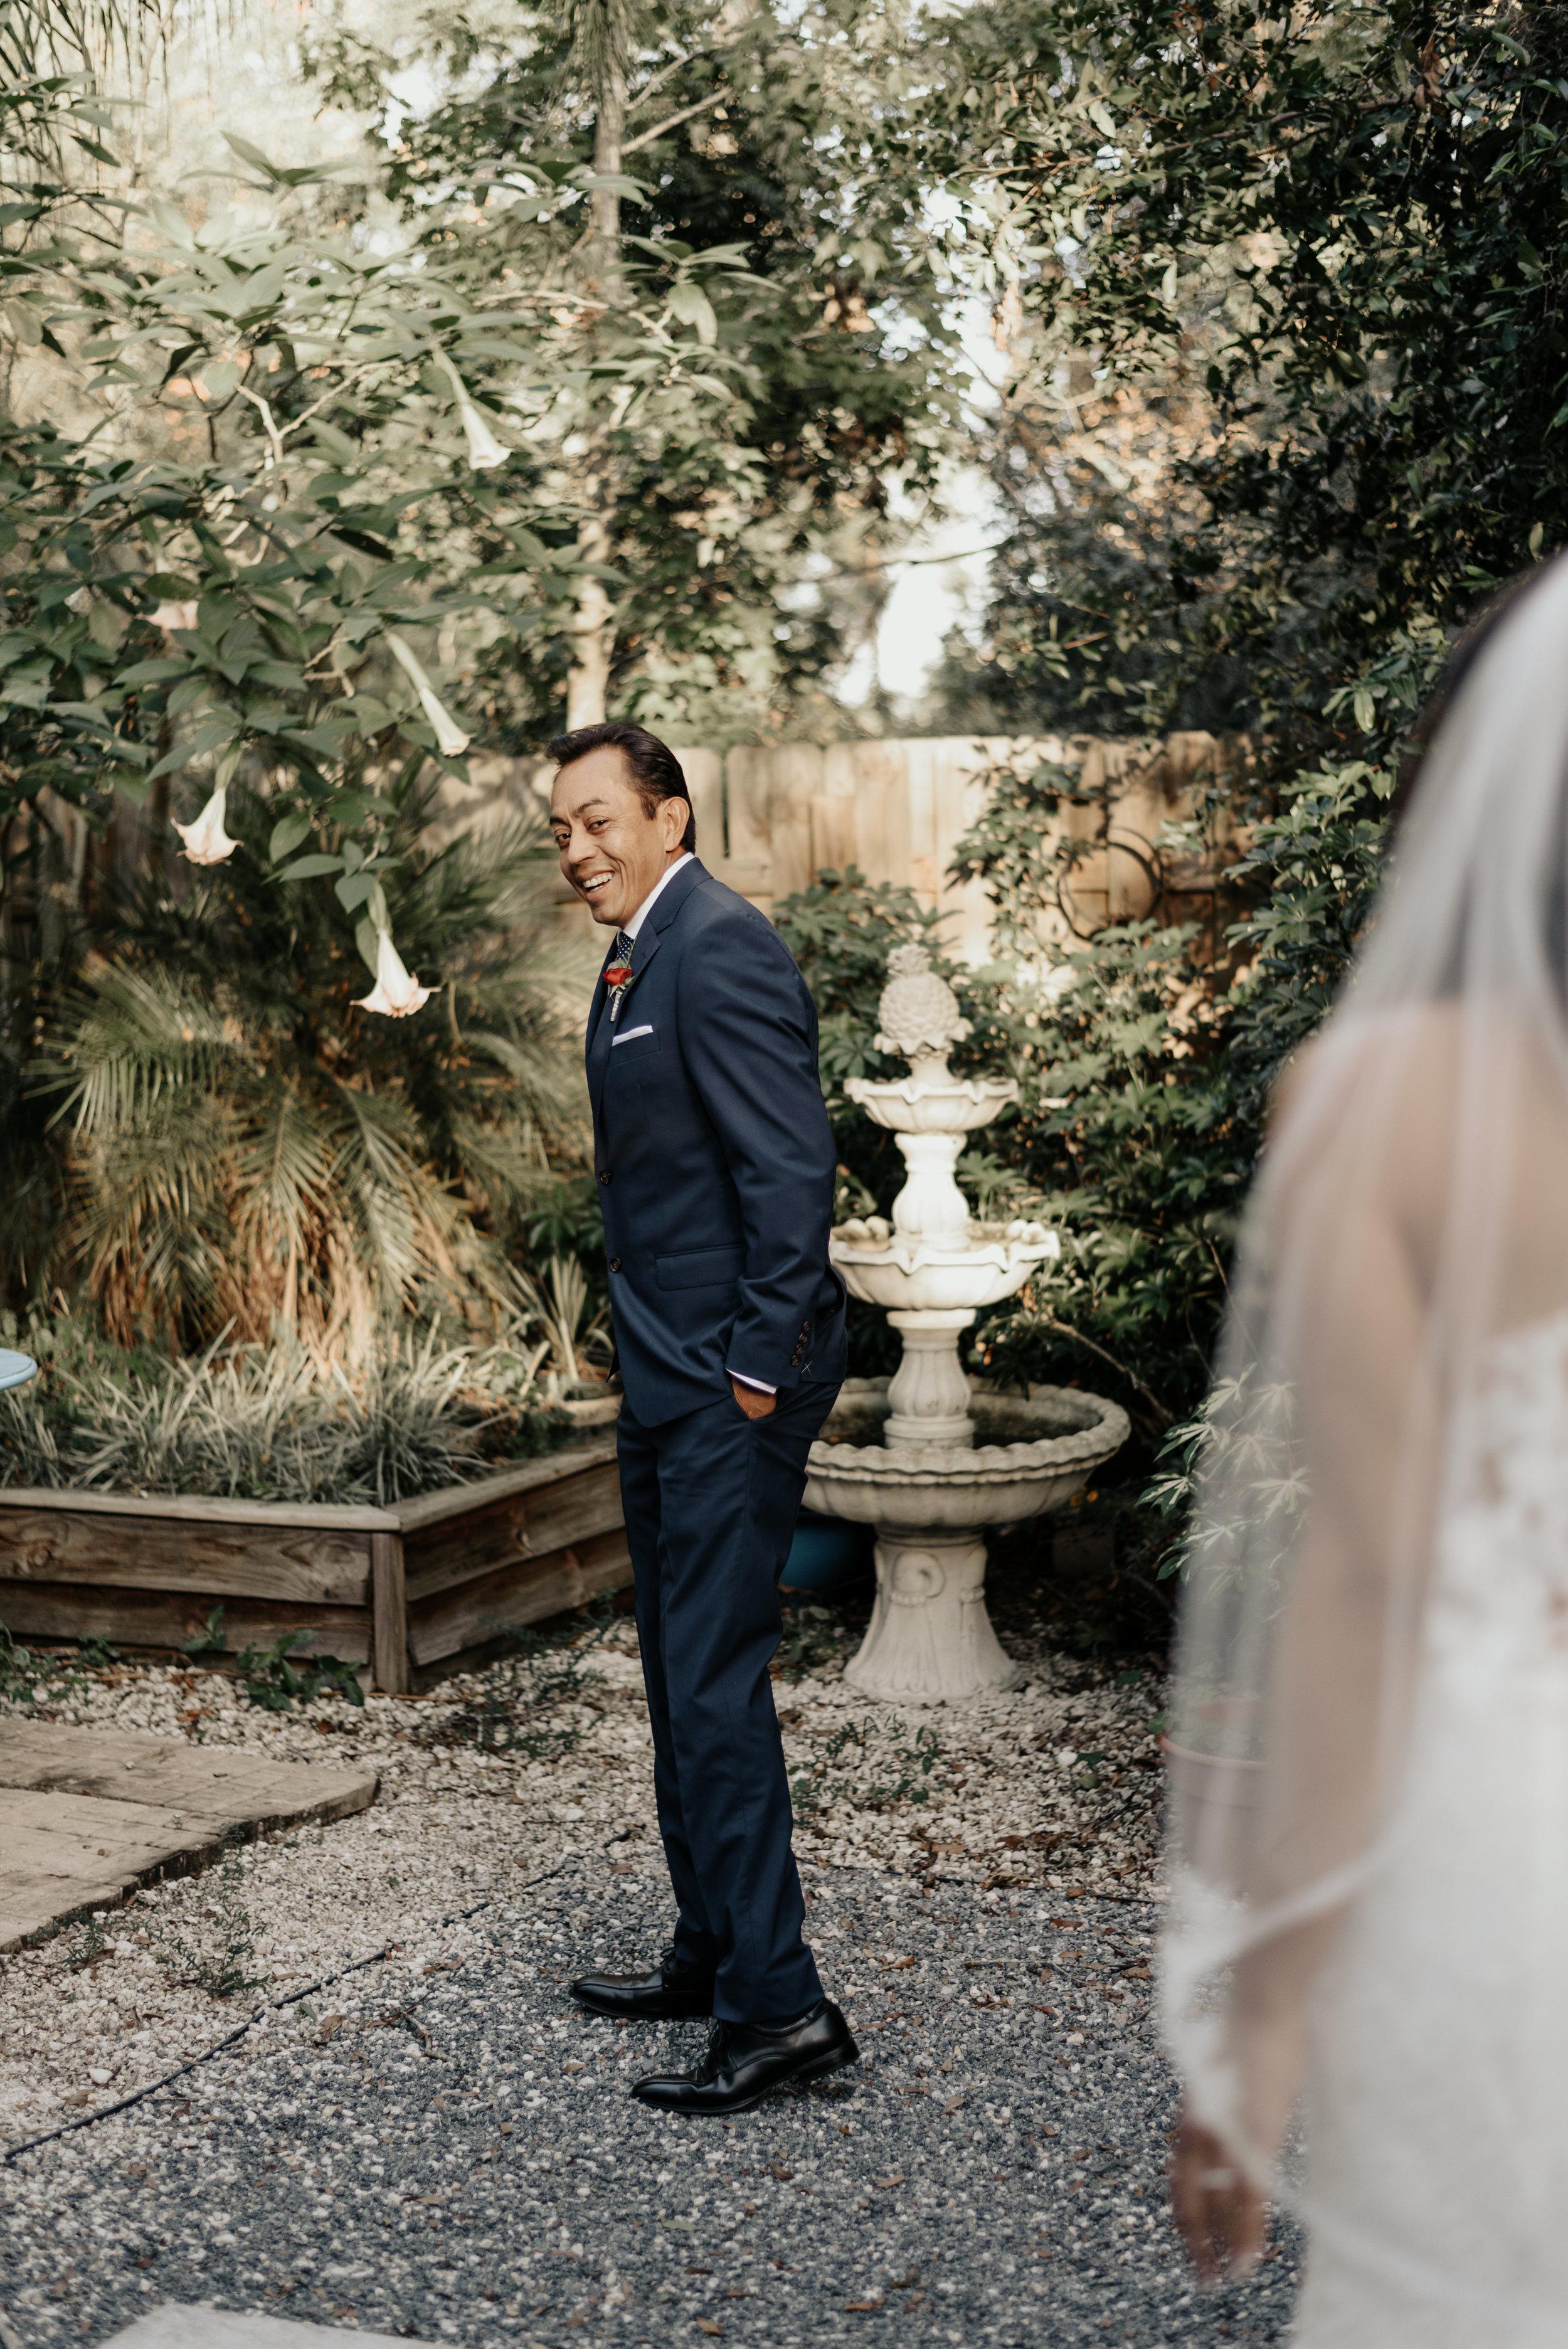 Kirstie-AJ-Wedding-8650.jpg